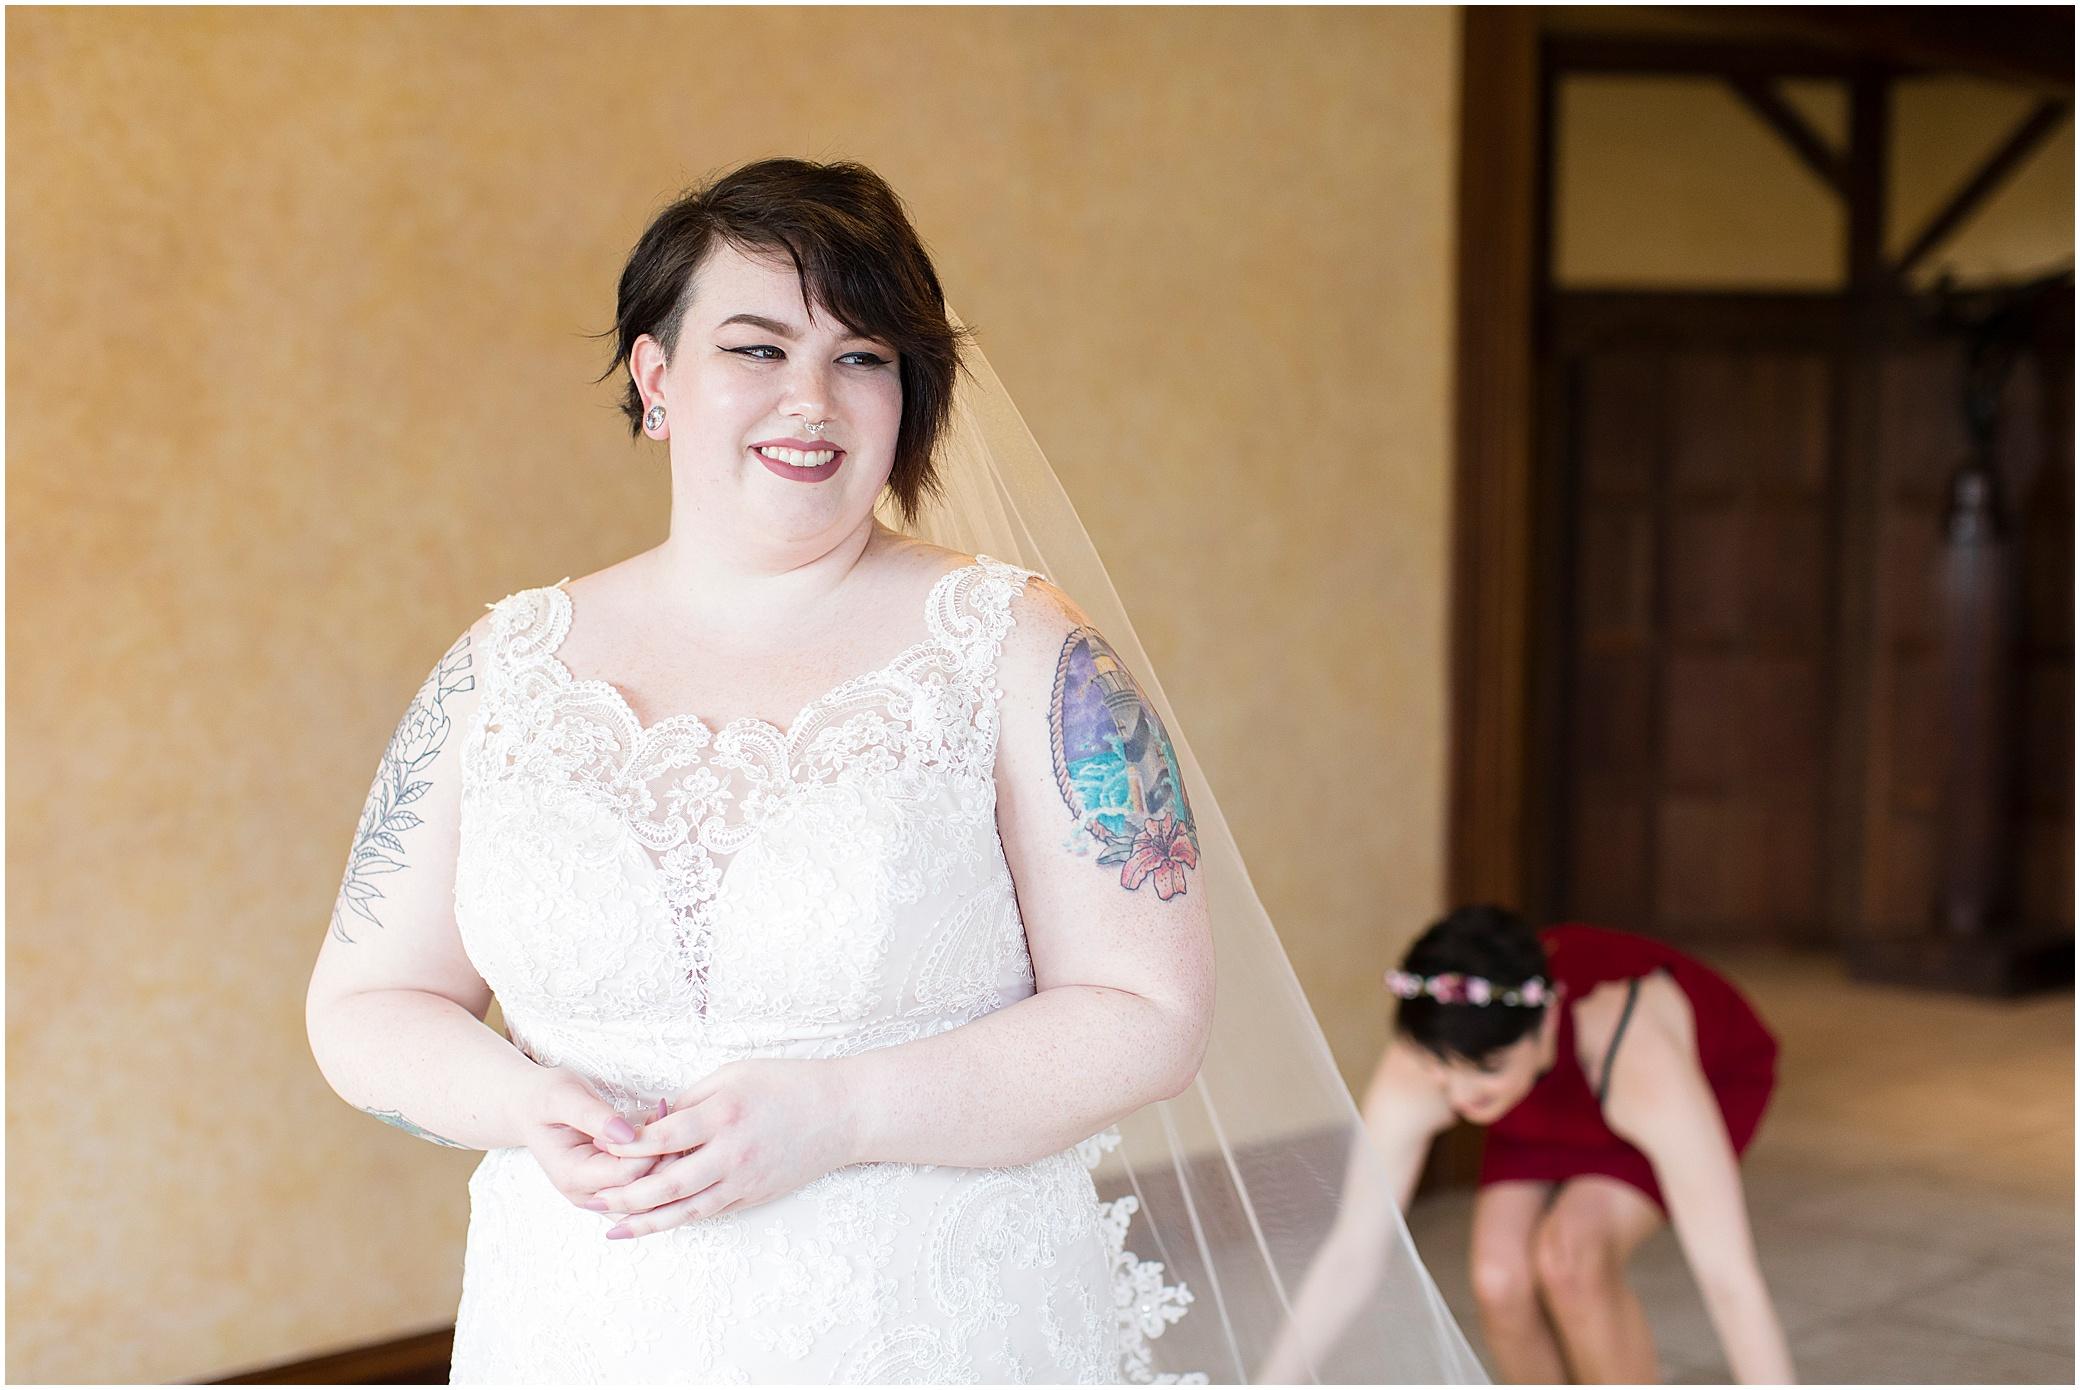 hermitage museum and gardens elopement, studio i do wedding dress, bride getting into wedding dress